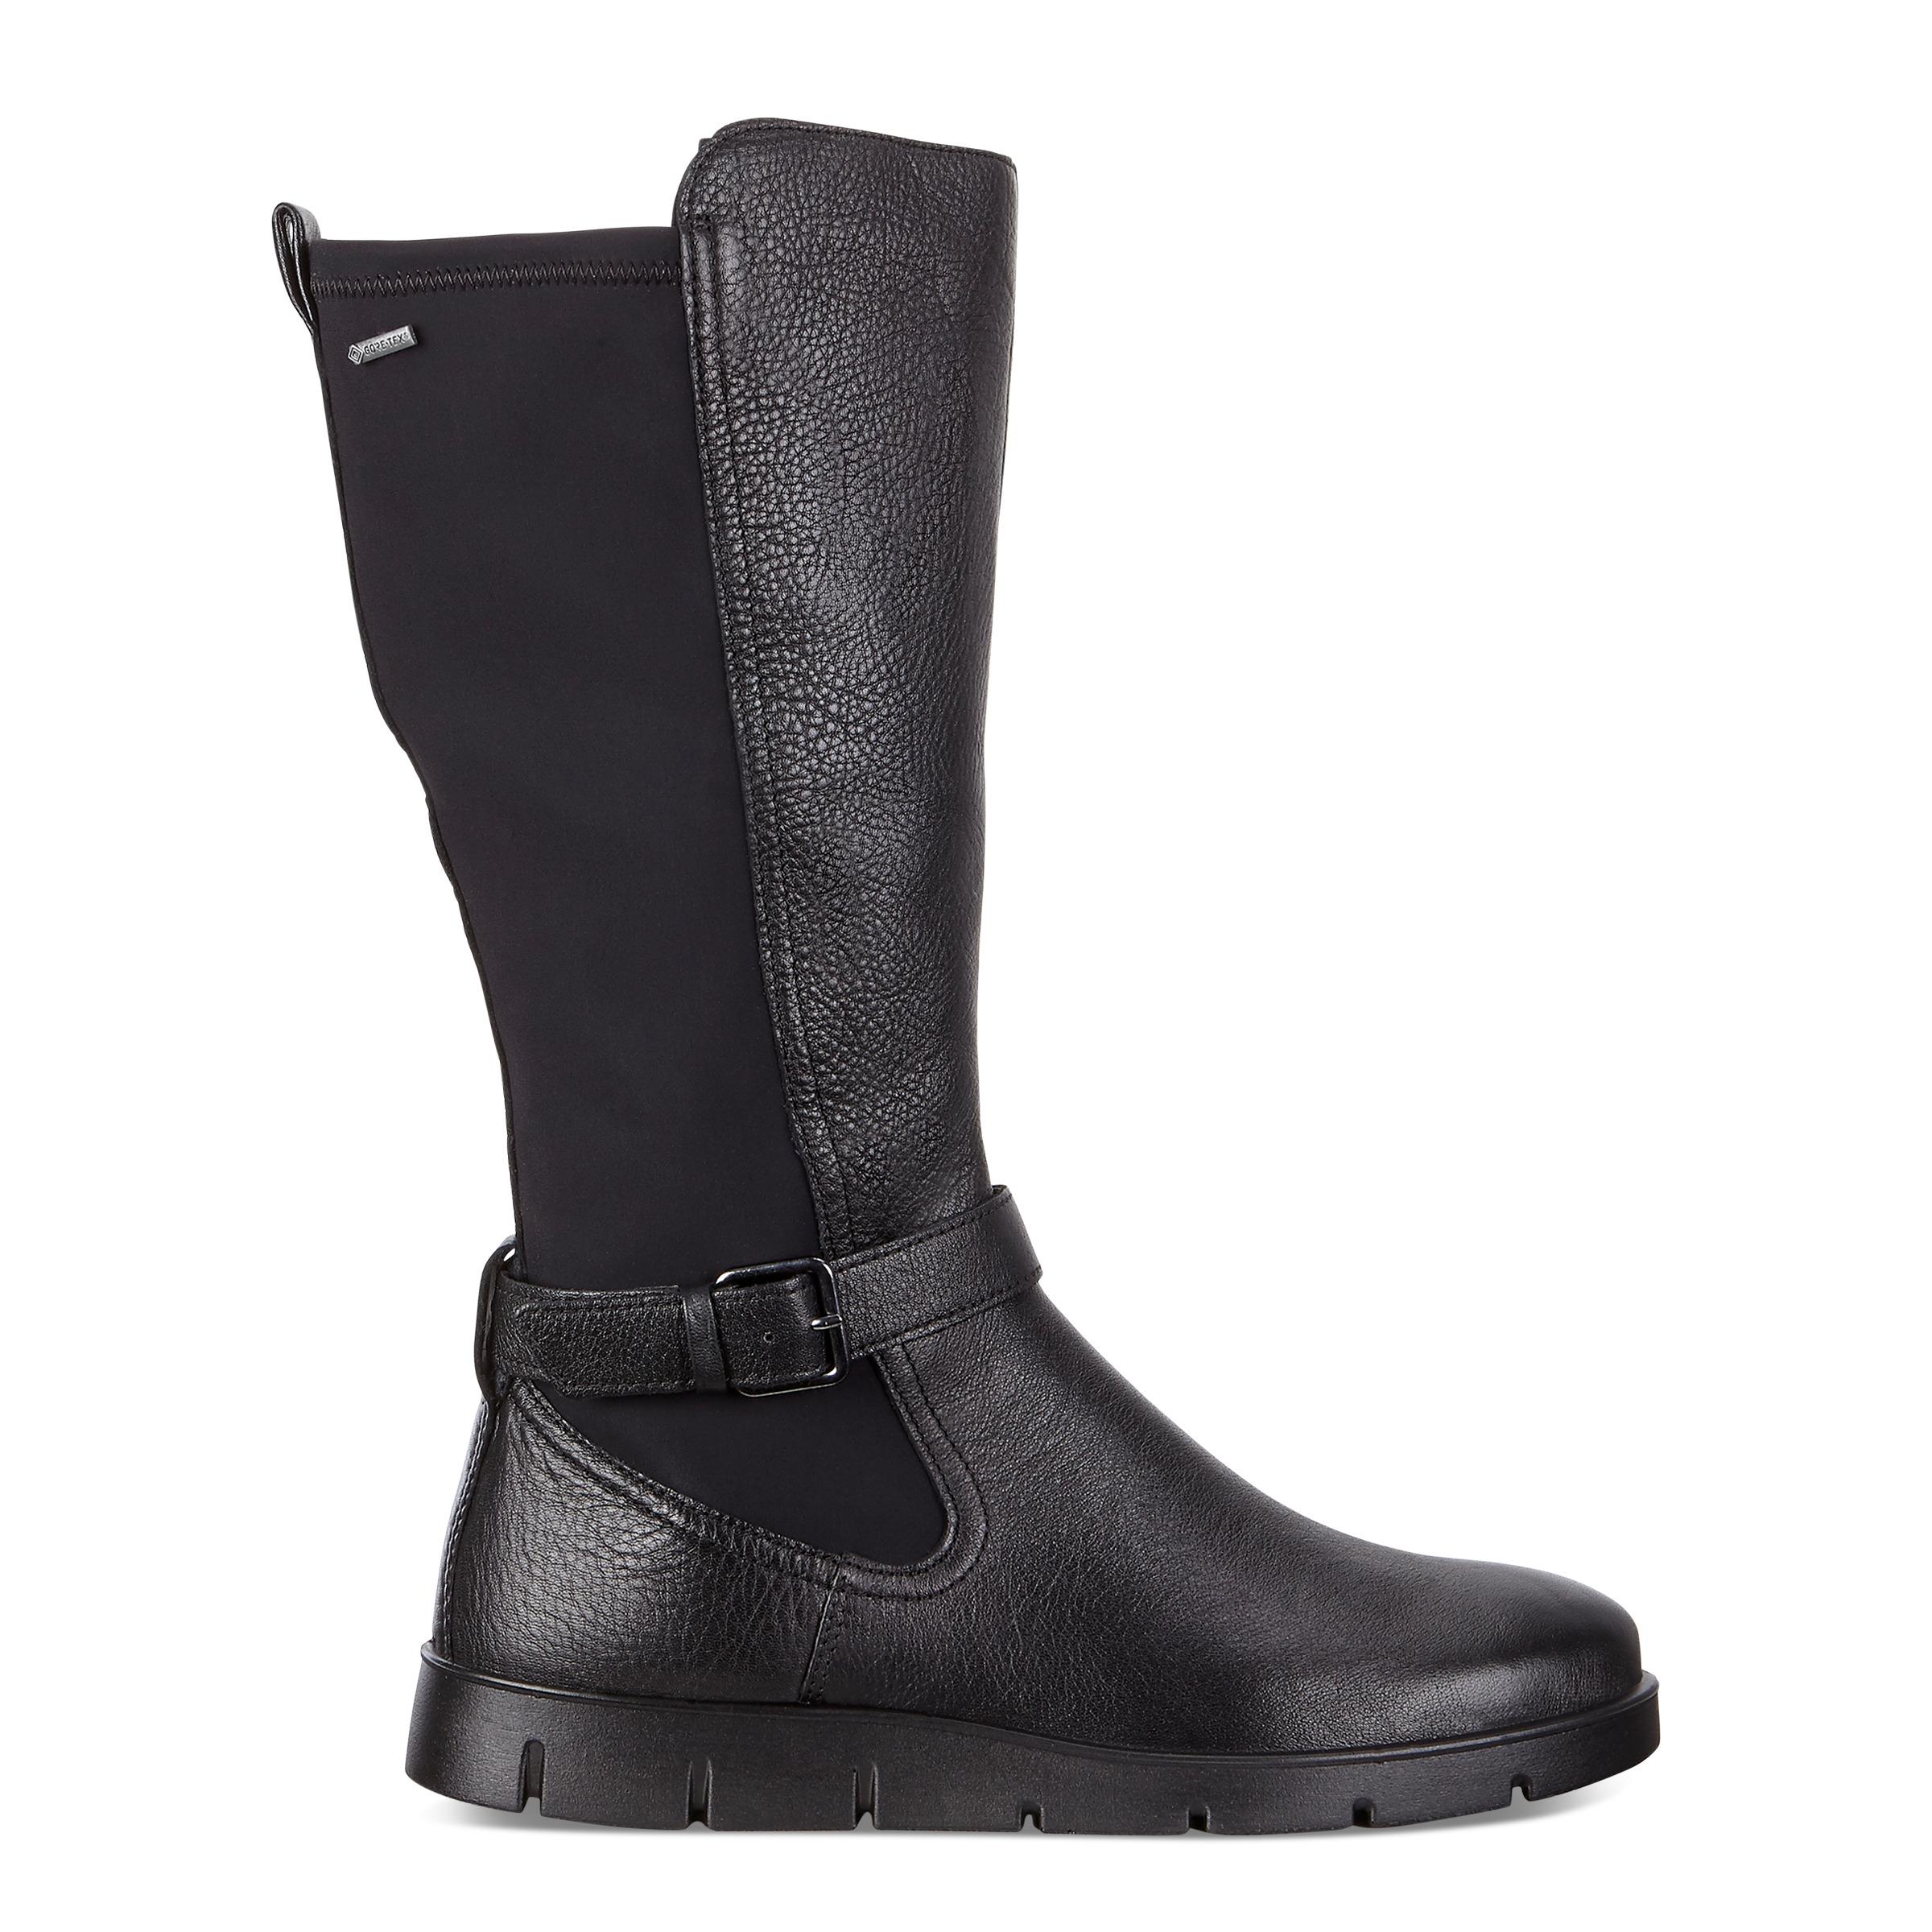 ECCO Bella Gtx Tall Boot Size 10-10.5 Black